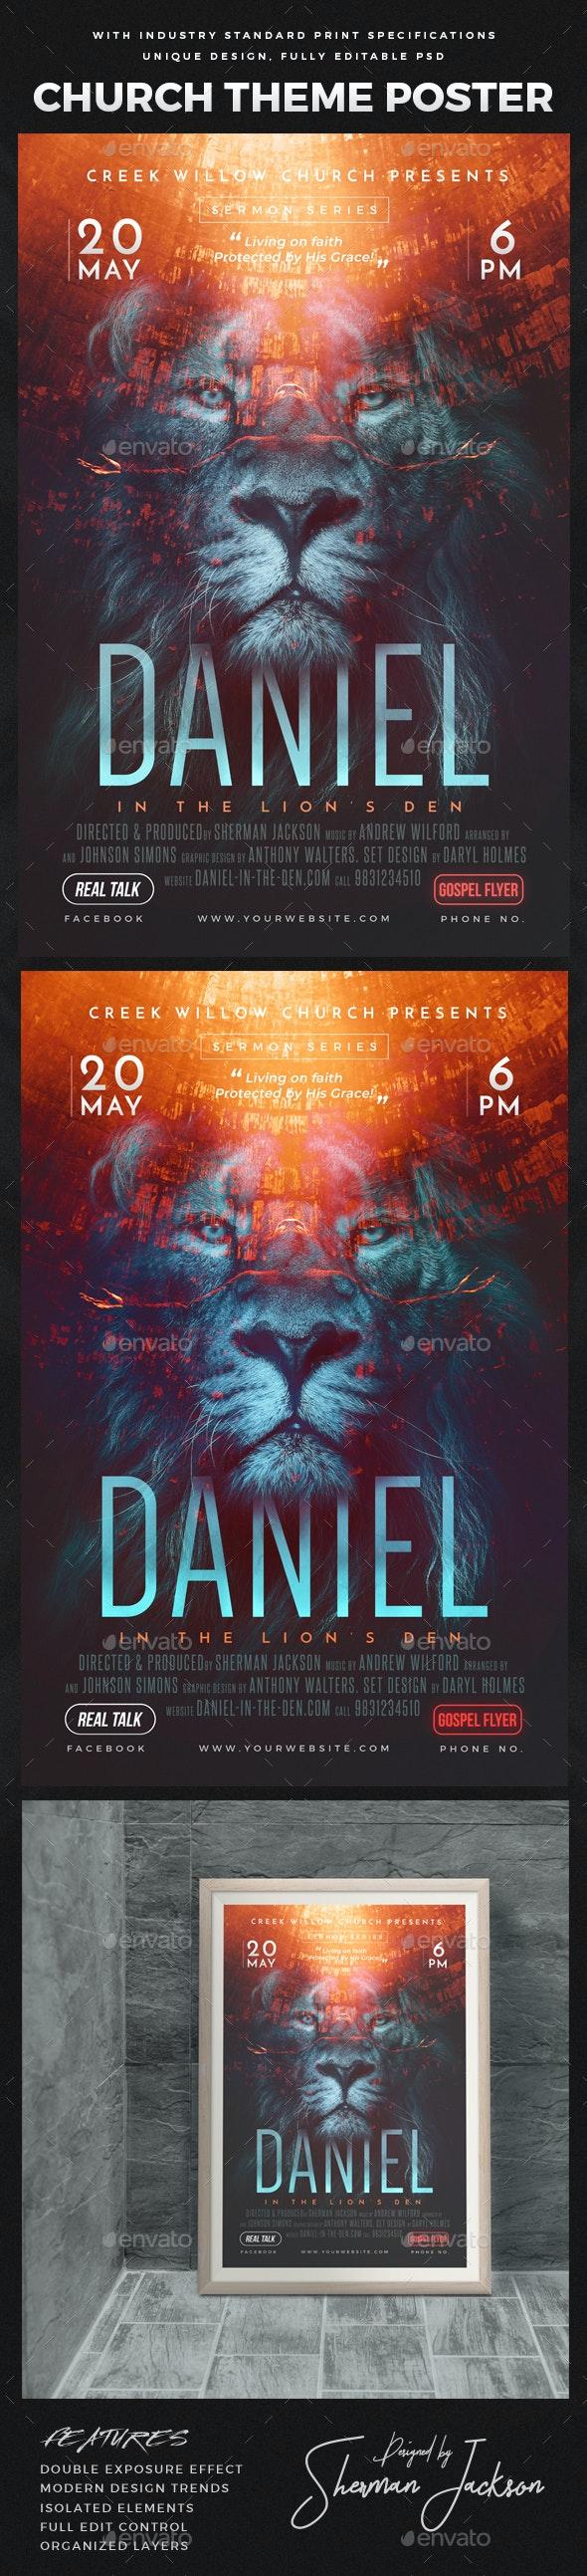 Church Themed Event Poster  - Daniel - Church Flyers